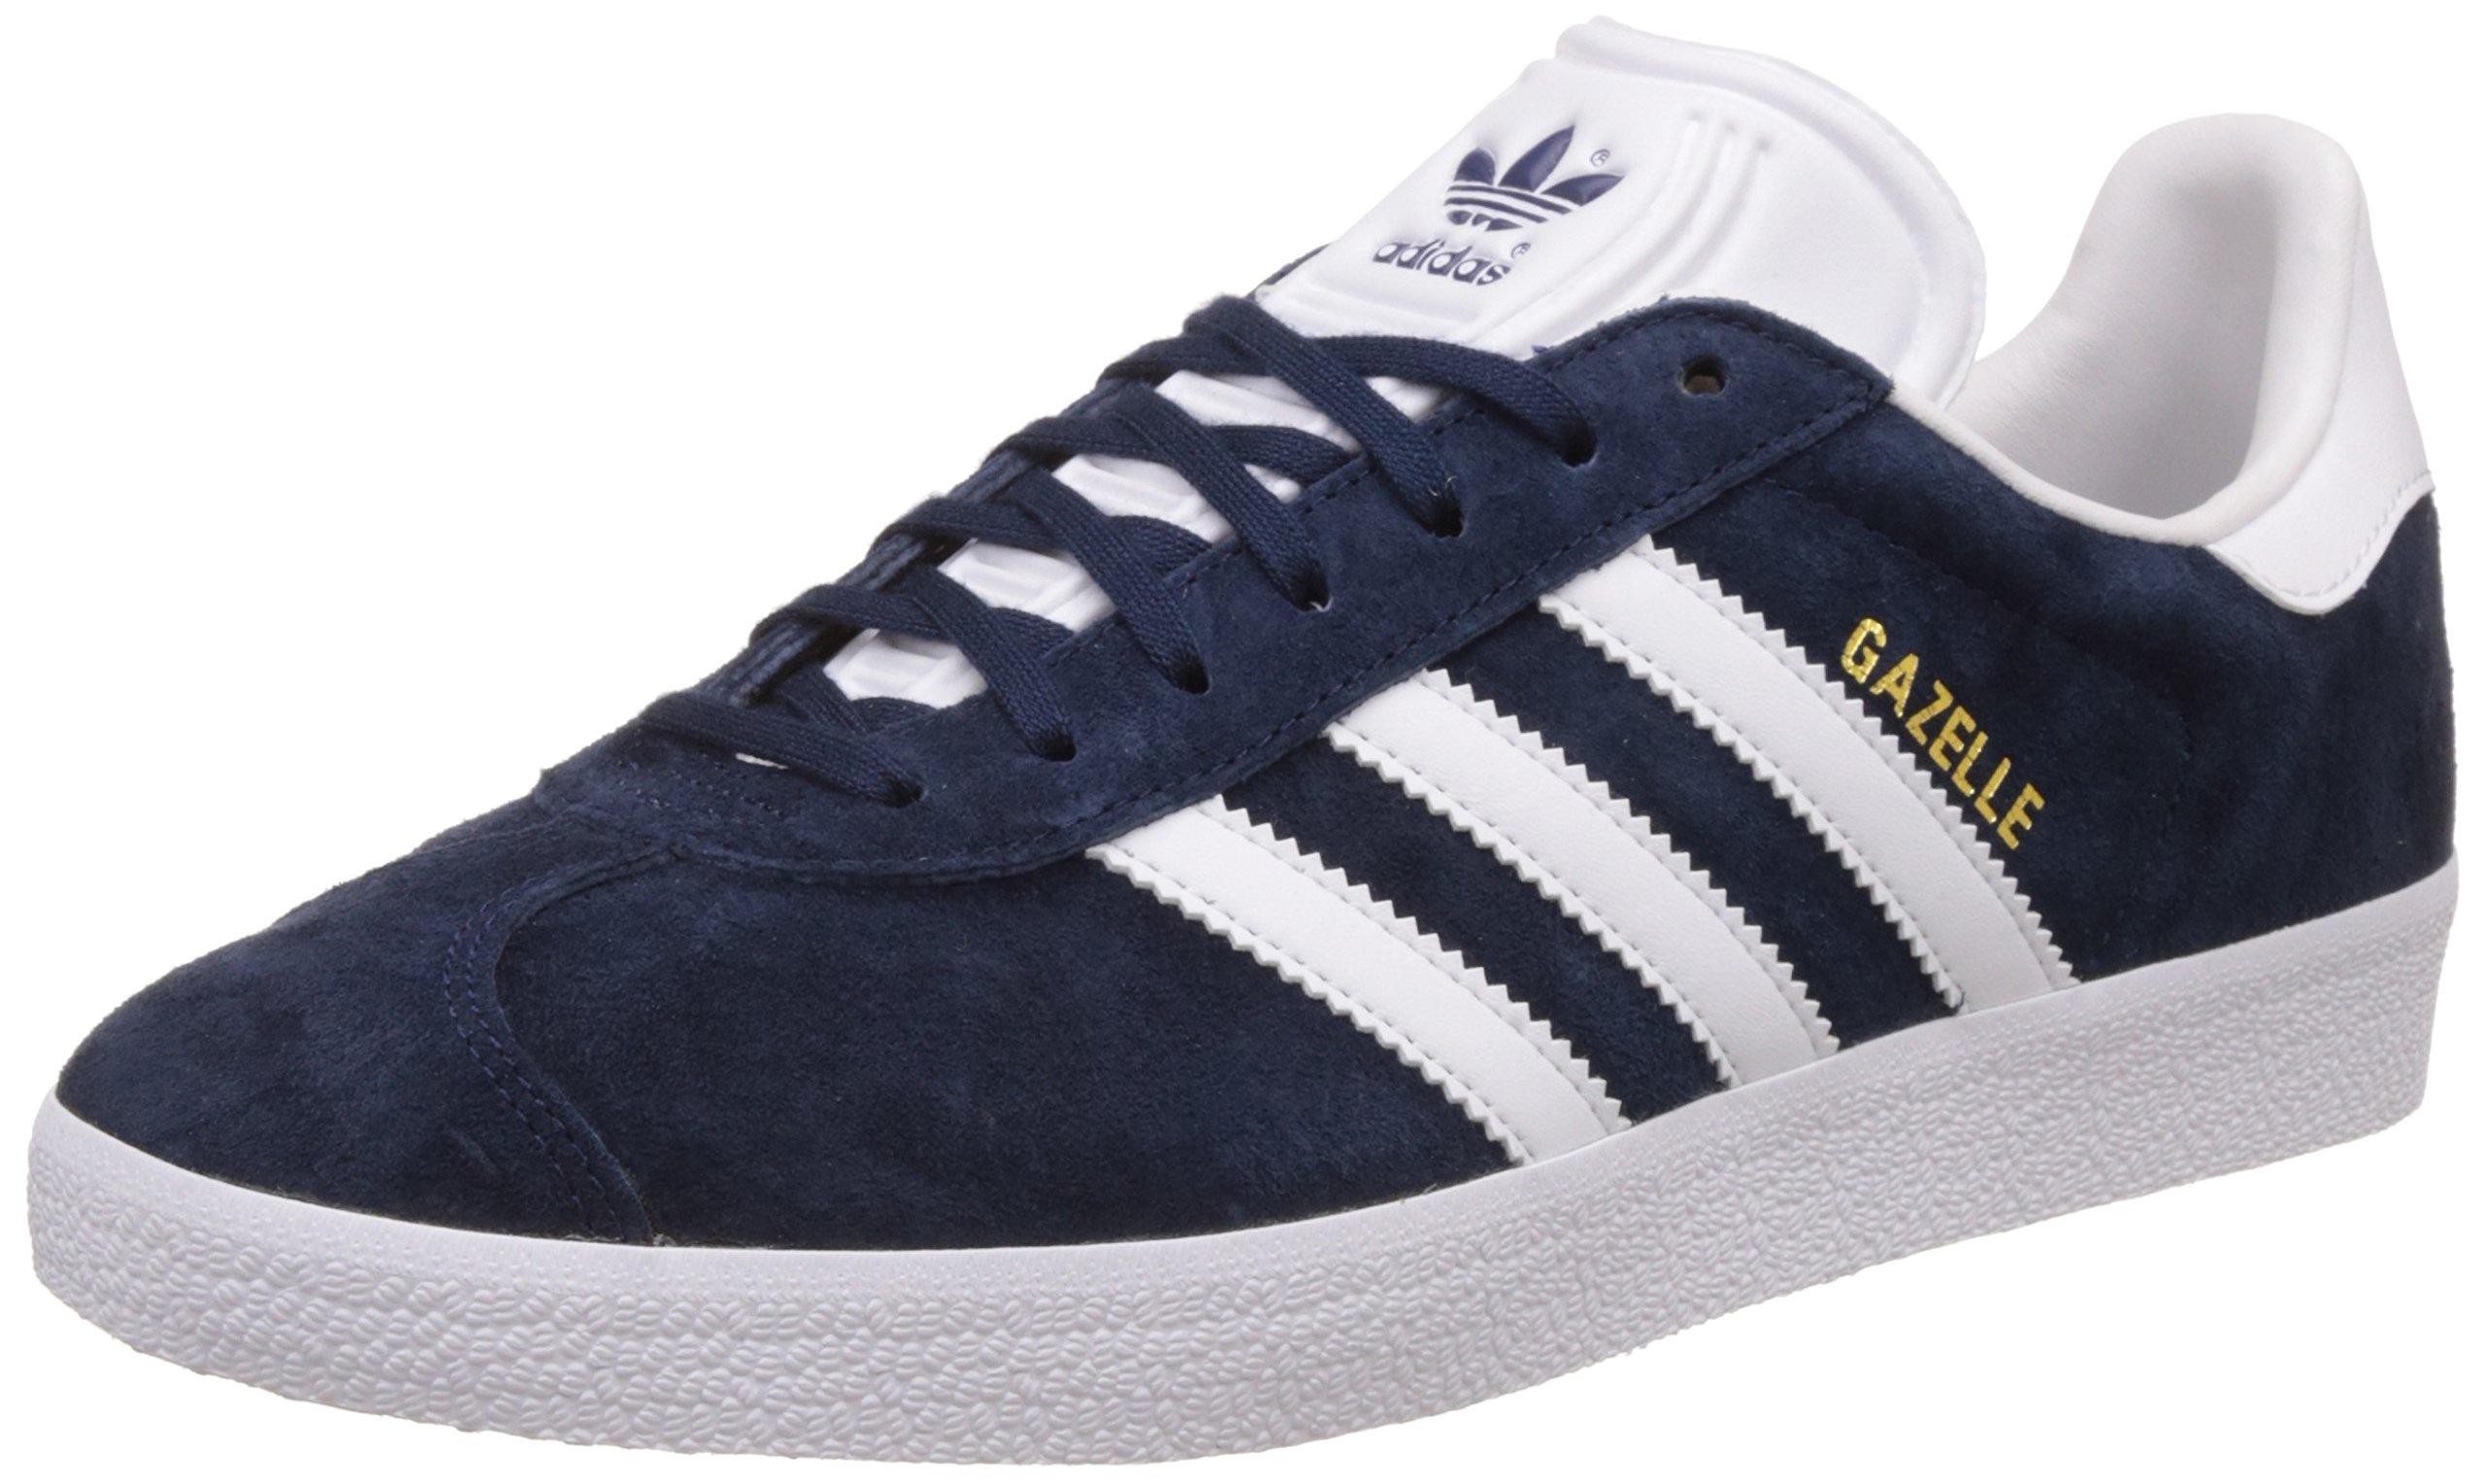 Adidas Originals Gazelle, Zapatillas Unisex Adulto, Varios Colores (Collegiate Navy/White/Gold Metalic), 47 1/3 EU